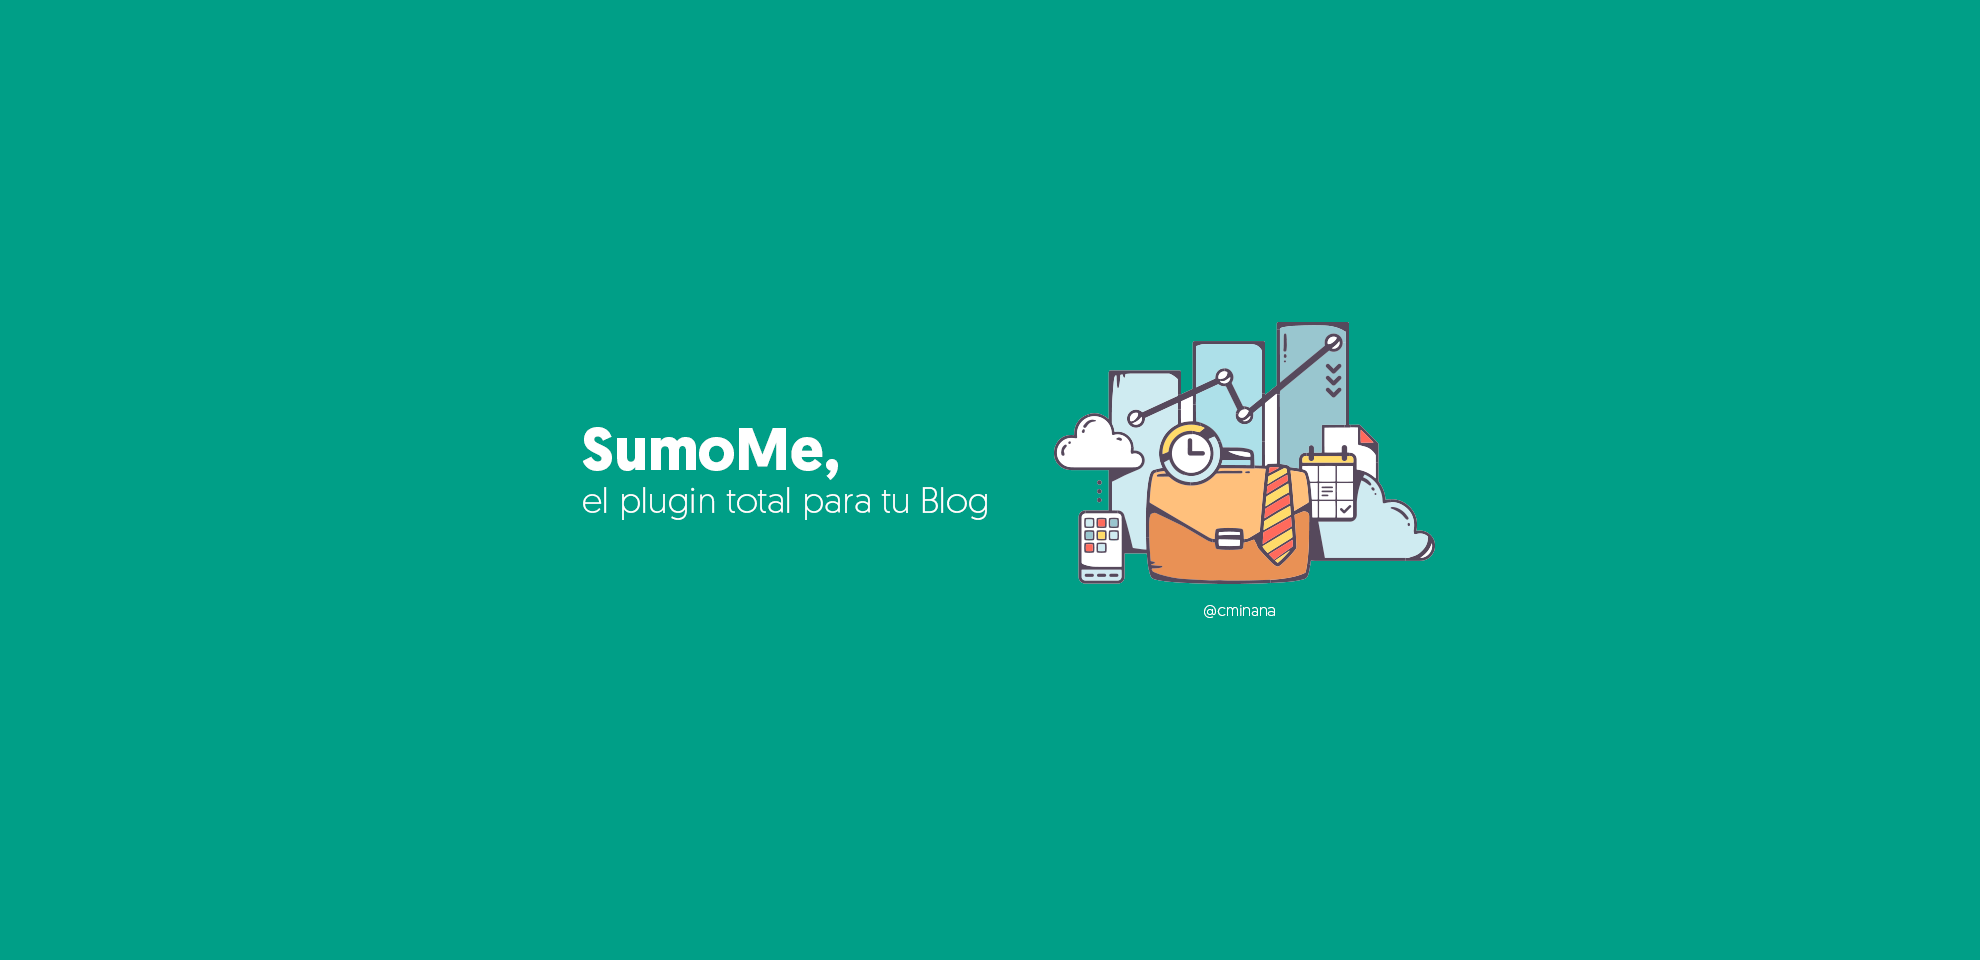 sumome plugin